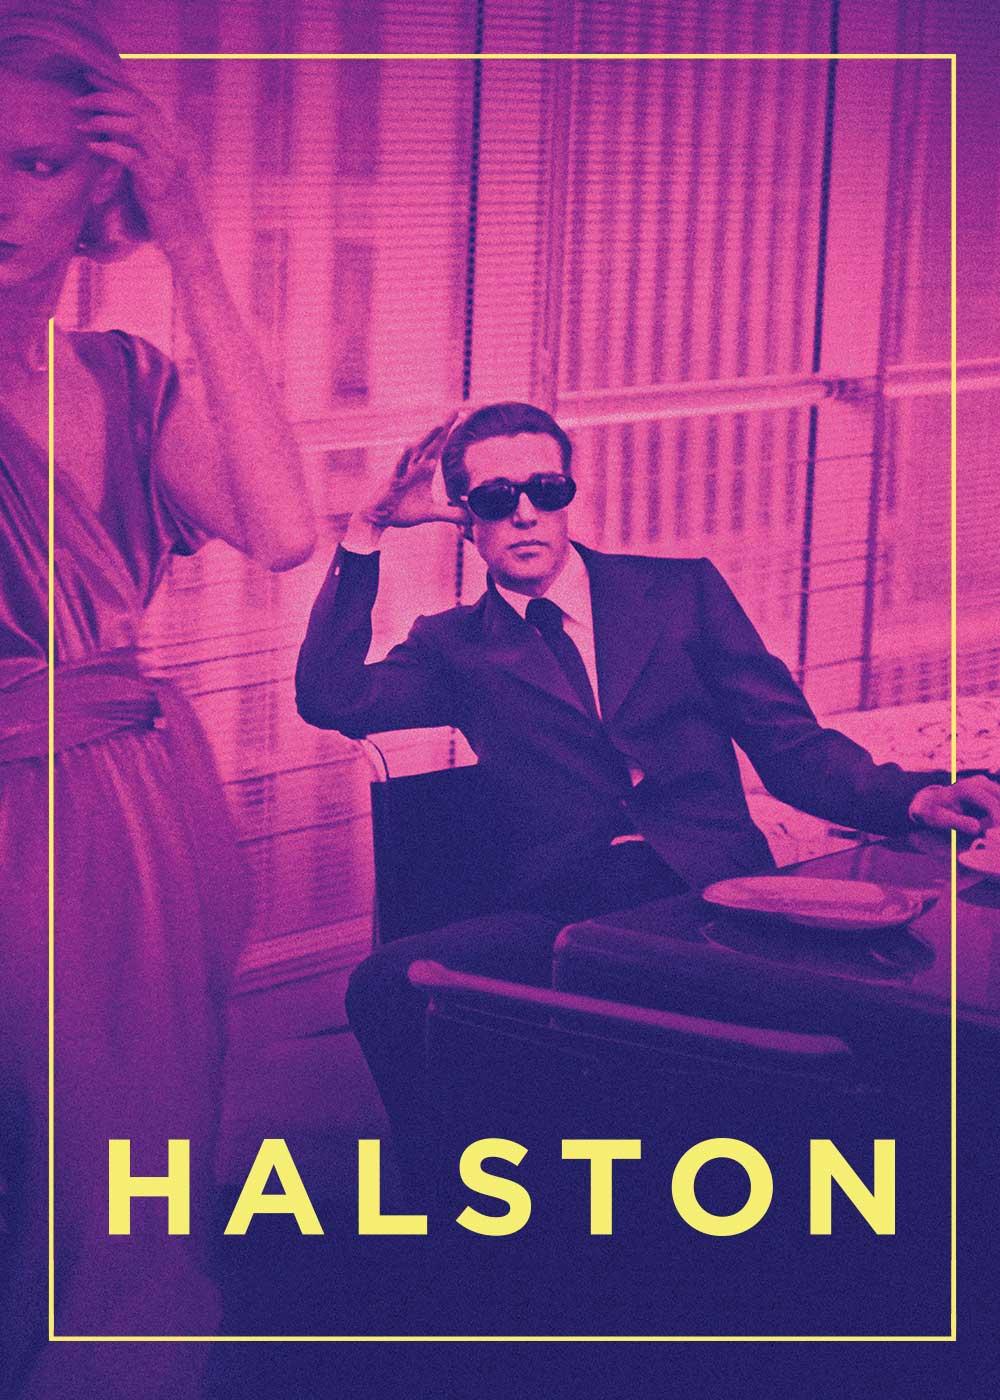 halston_poster.jpg